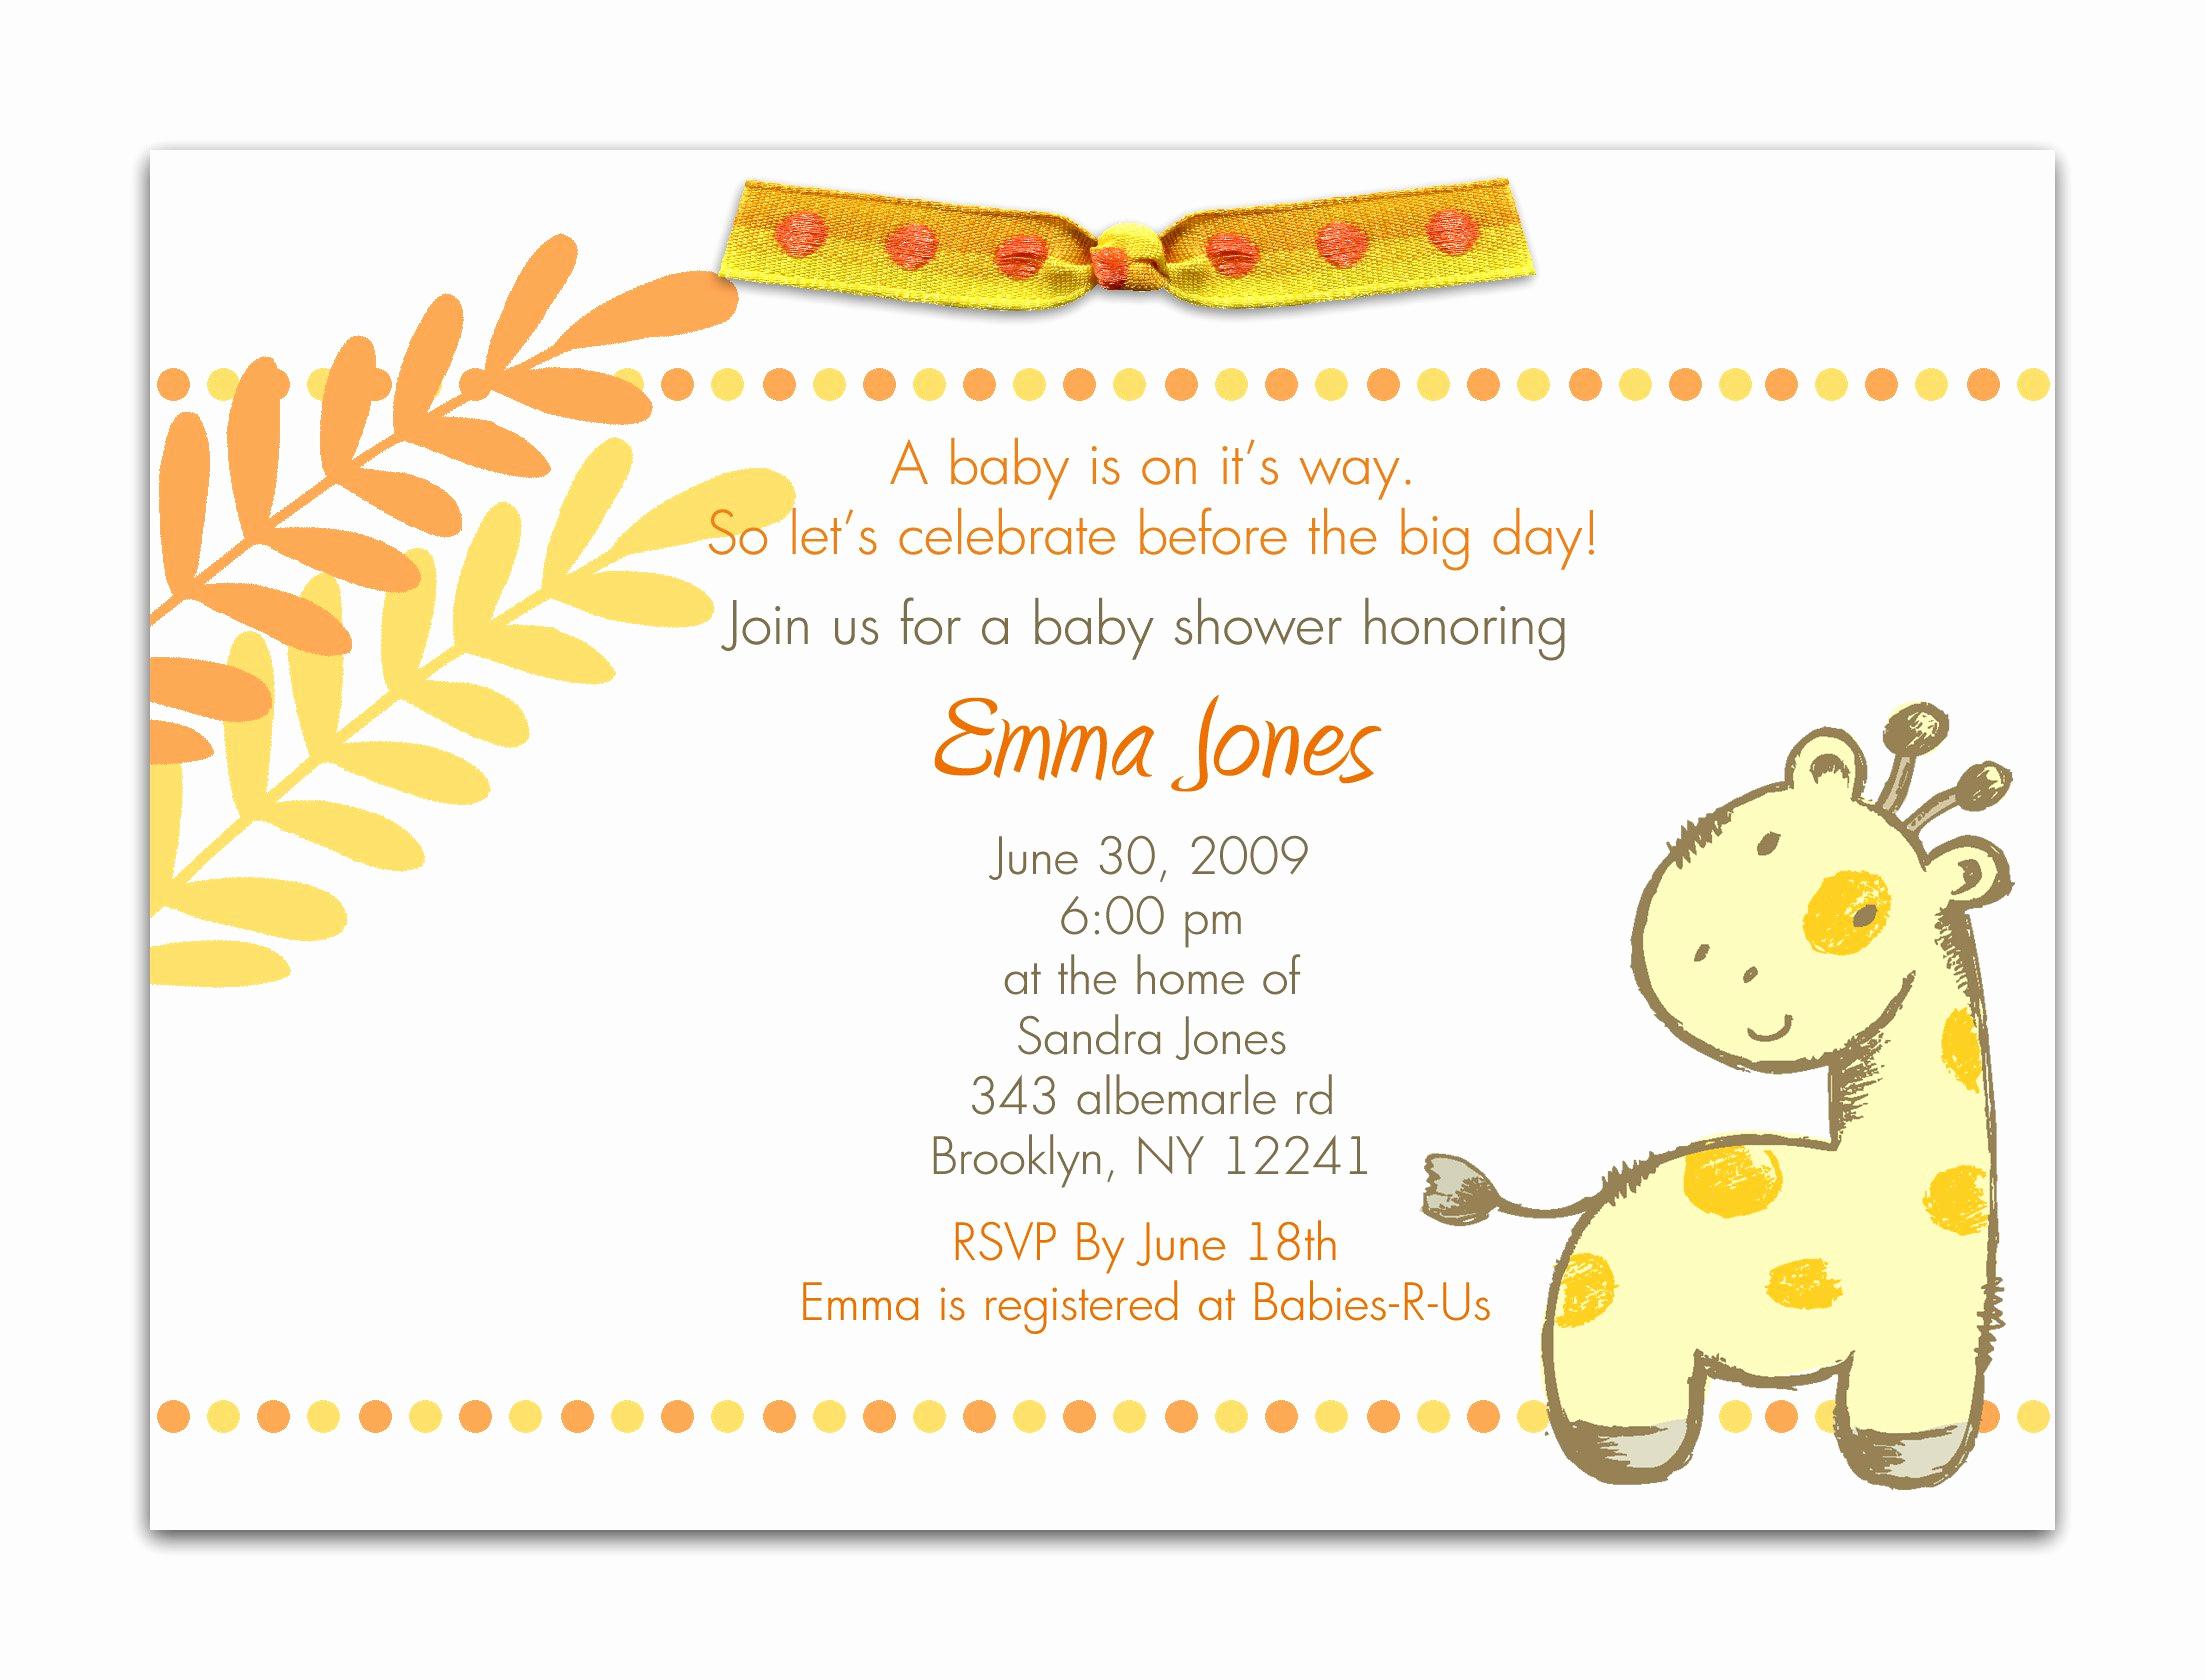 Baby Shower Invitation Wording Best Of Baby Shower Invitation Baby Shower Invitation Templates